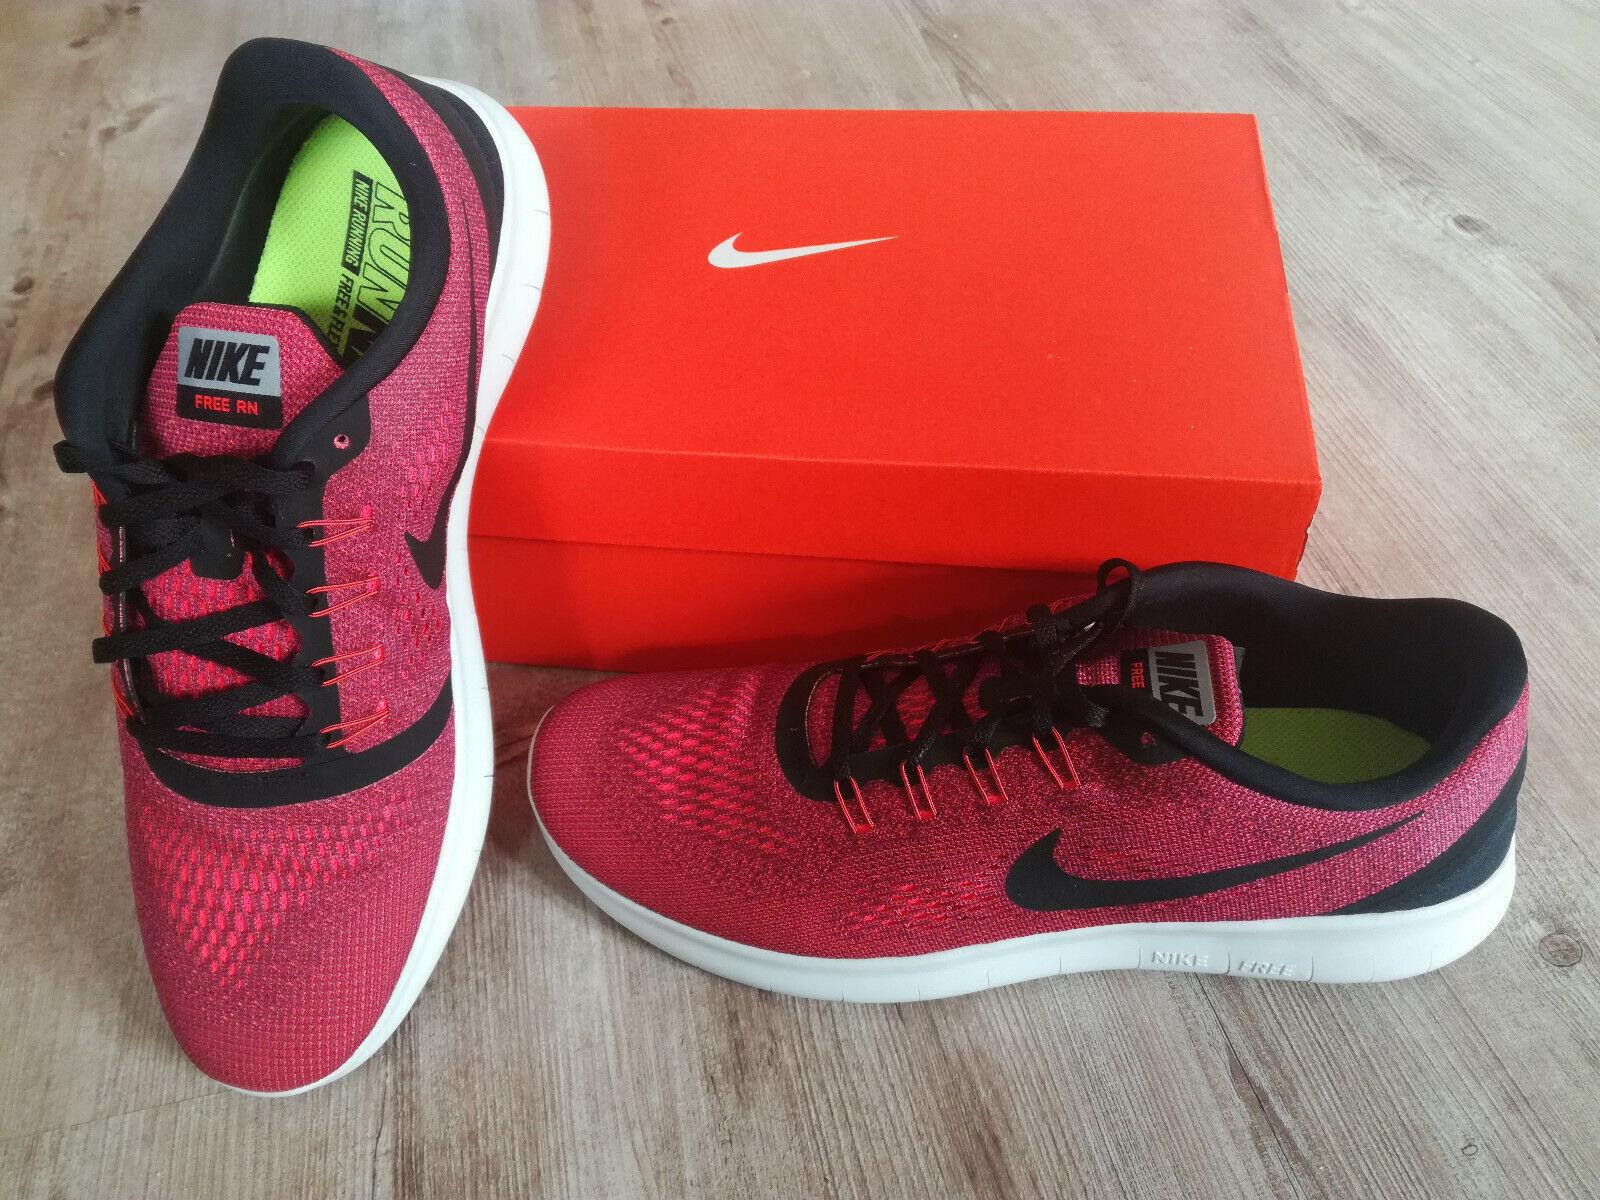 Nike Free RN Herren-Laufschuh Größe EUR 46 Schwarz Rot(Hyper Orange) Run Sneaker